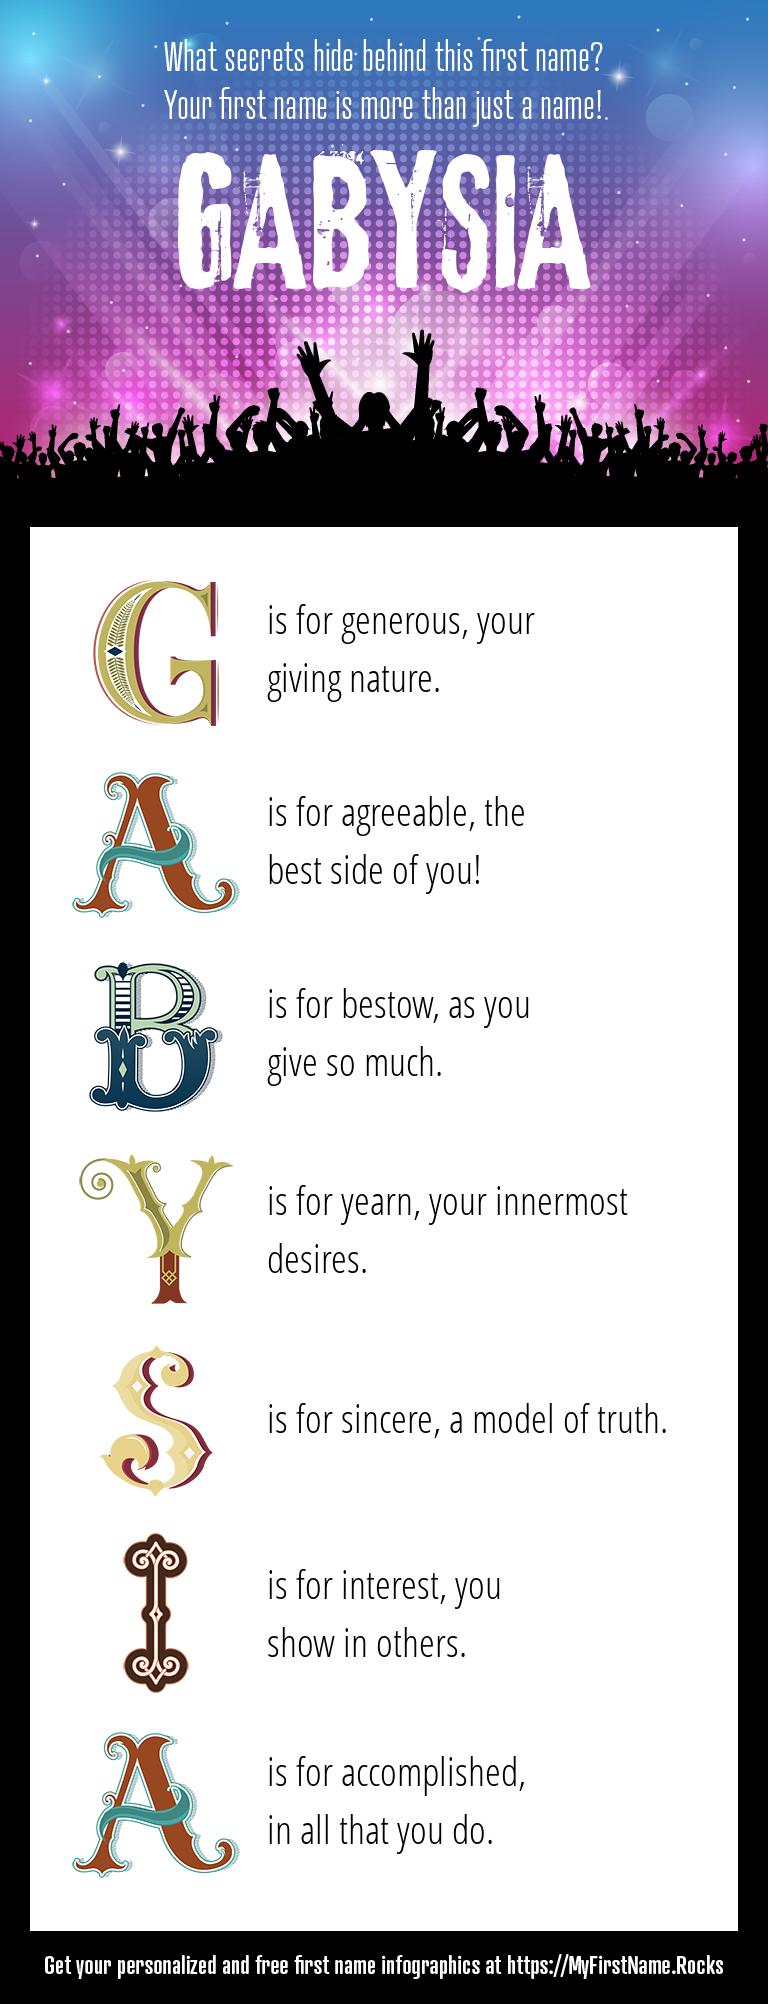 Gabysia Infographics